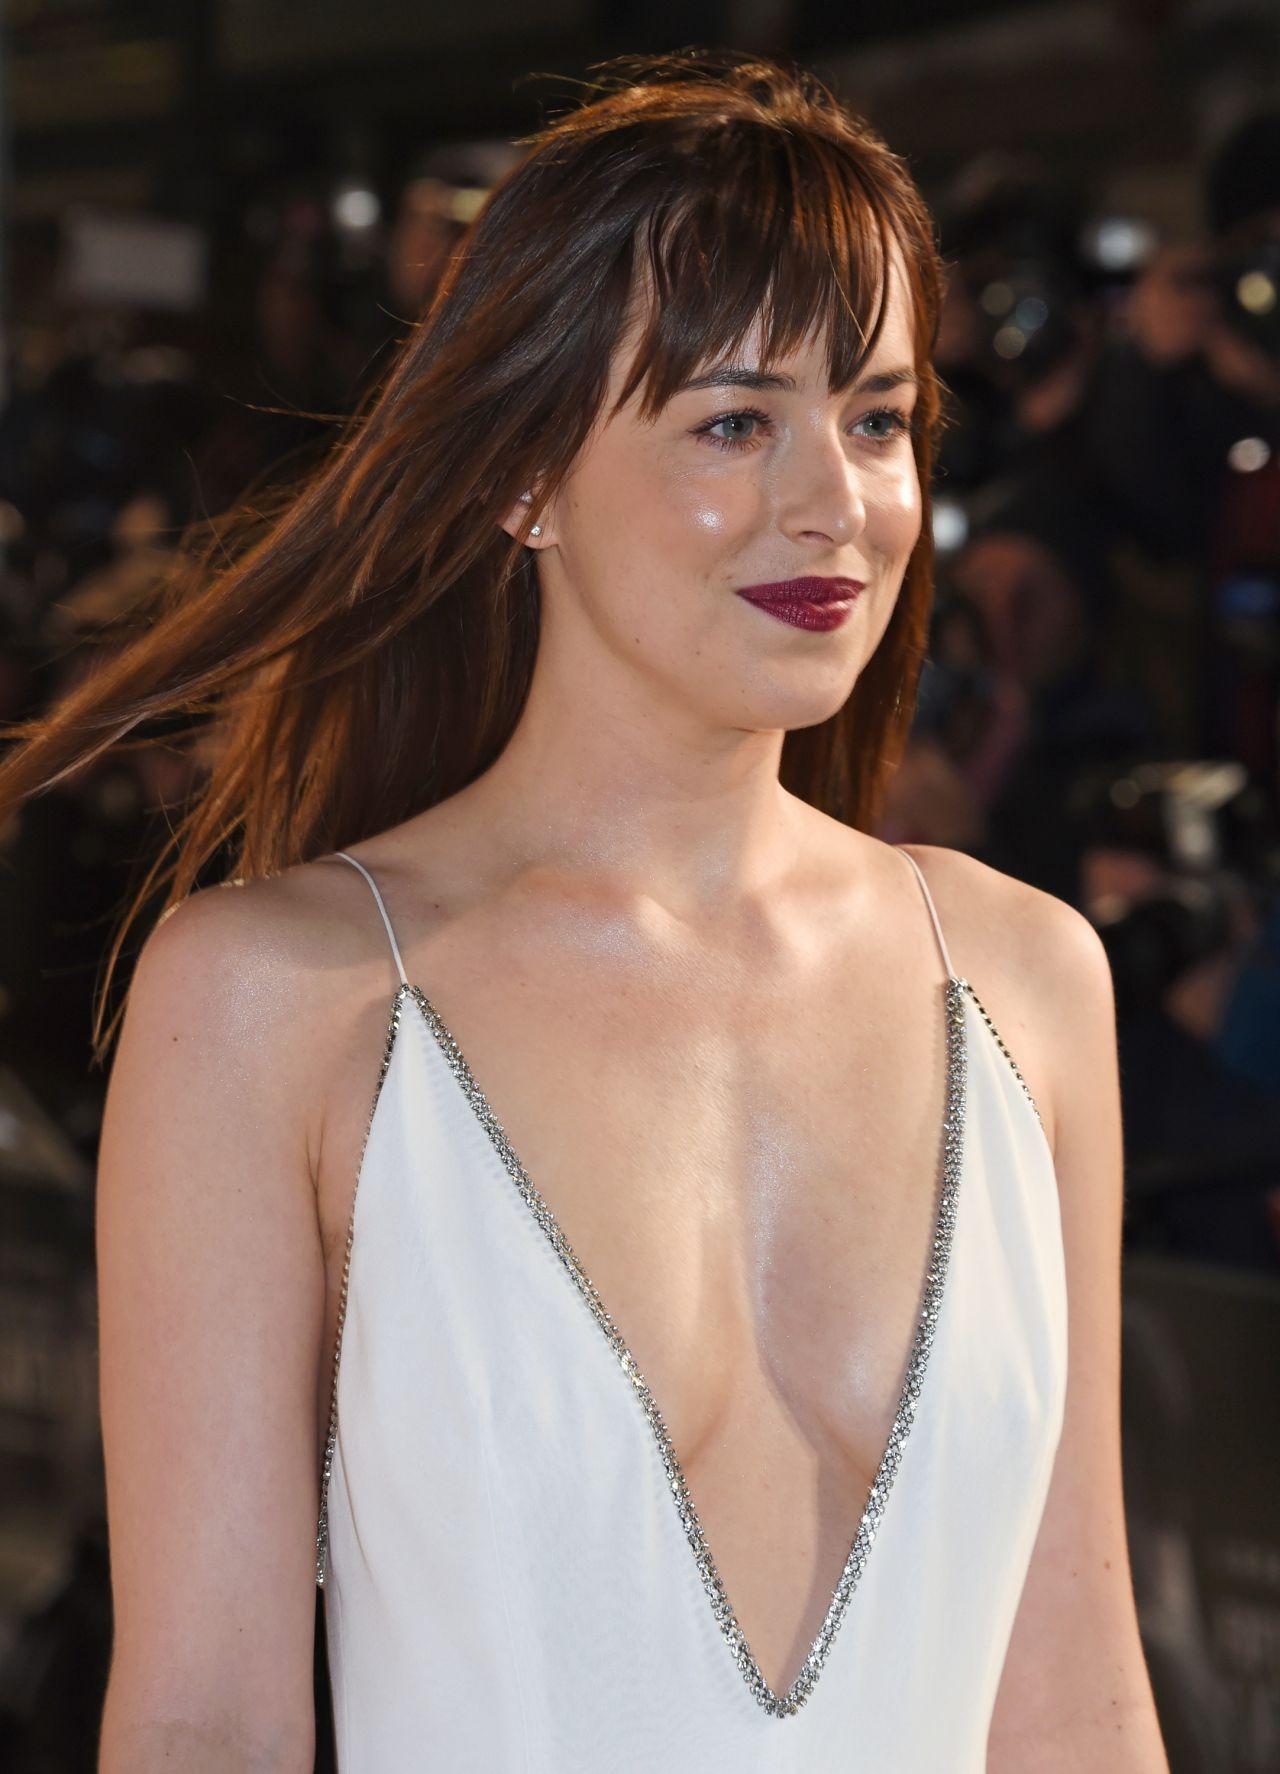 Dakota Johnson Fifty Shades Of Grey Premiere In London